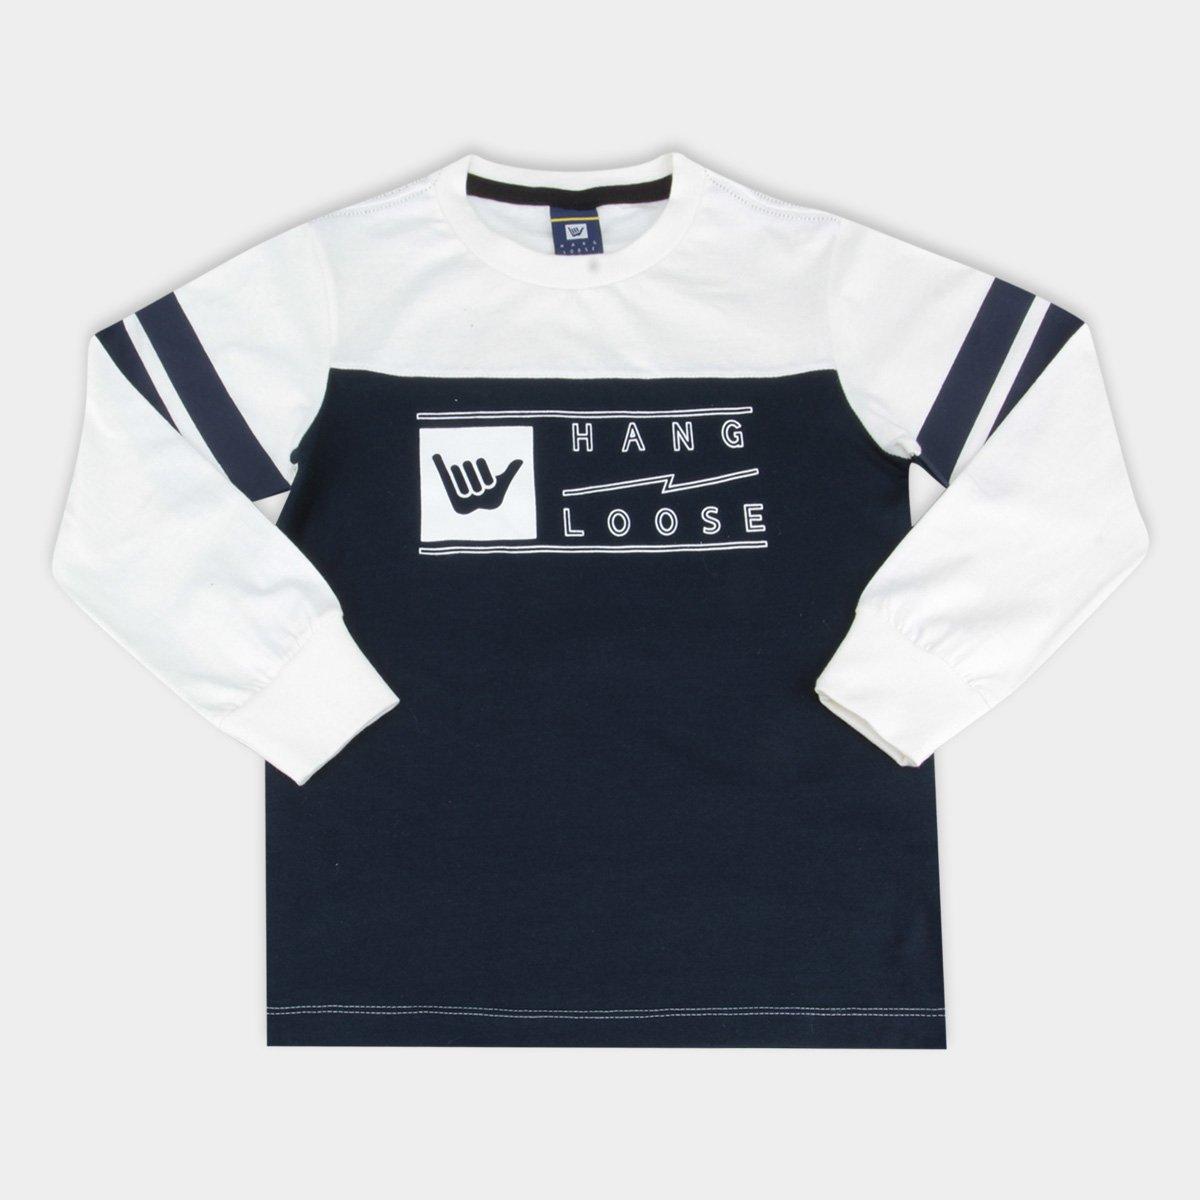 74b964aaa6df5 Camiseta Infantil Hang Loose Manga Longa Estampada Masculina - Branco e  Marinho - Compre Agora